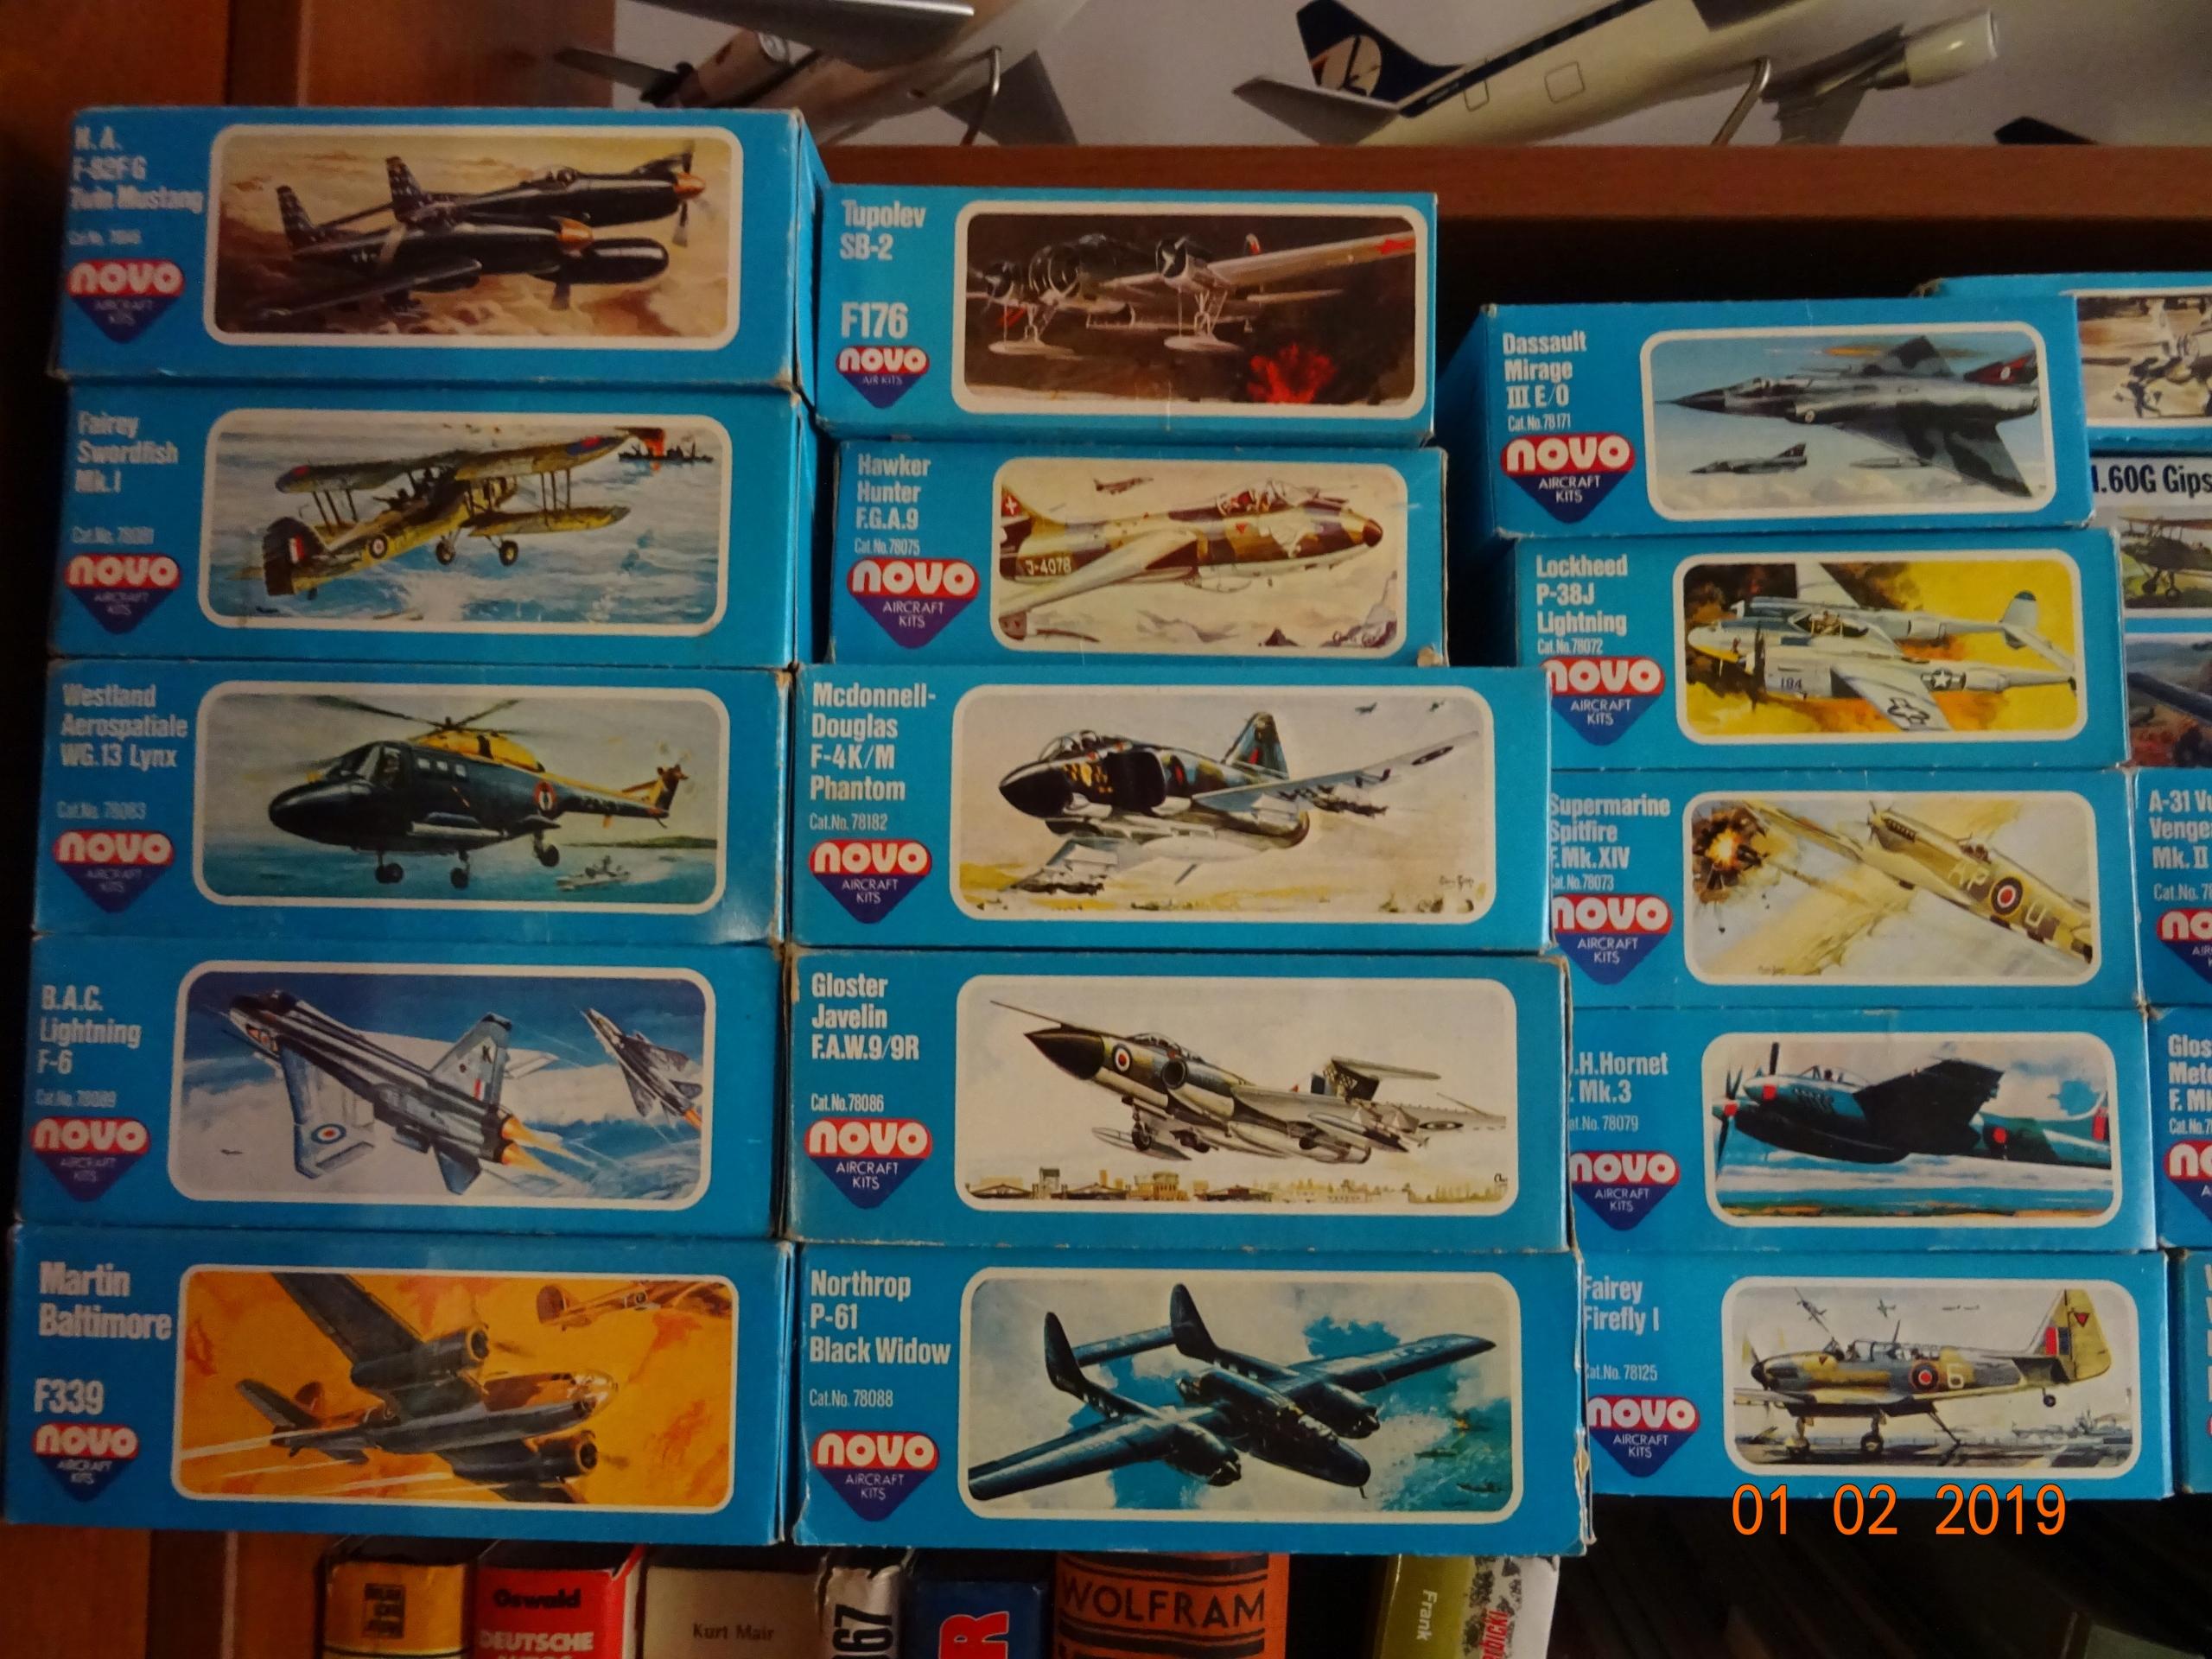 Kolekcja modeli Frog/Novo 30szt - 7818237796 - oficjalne ...